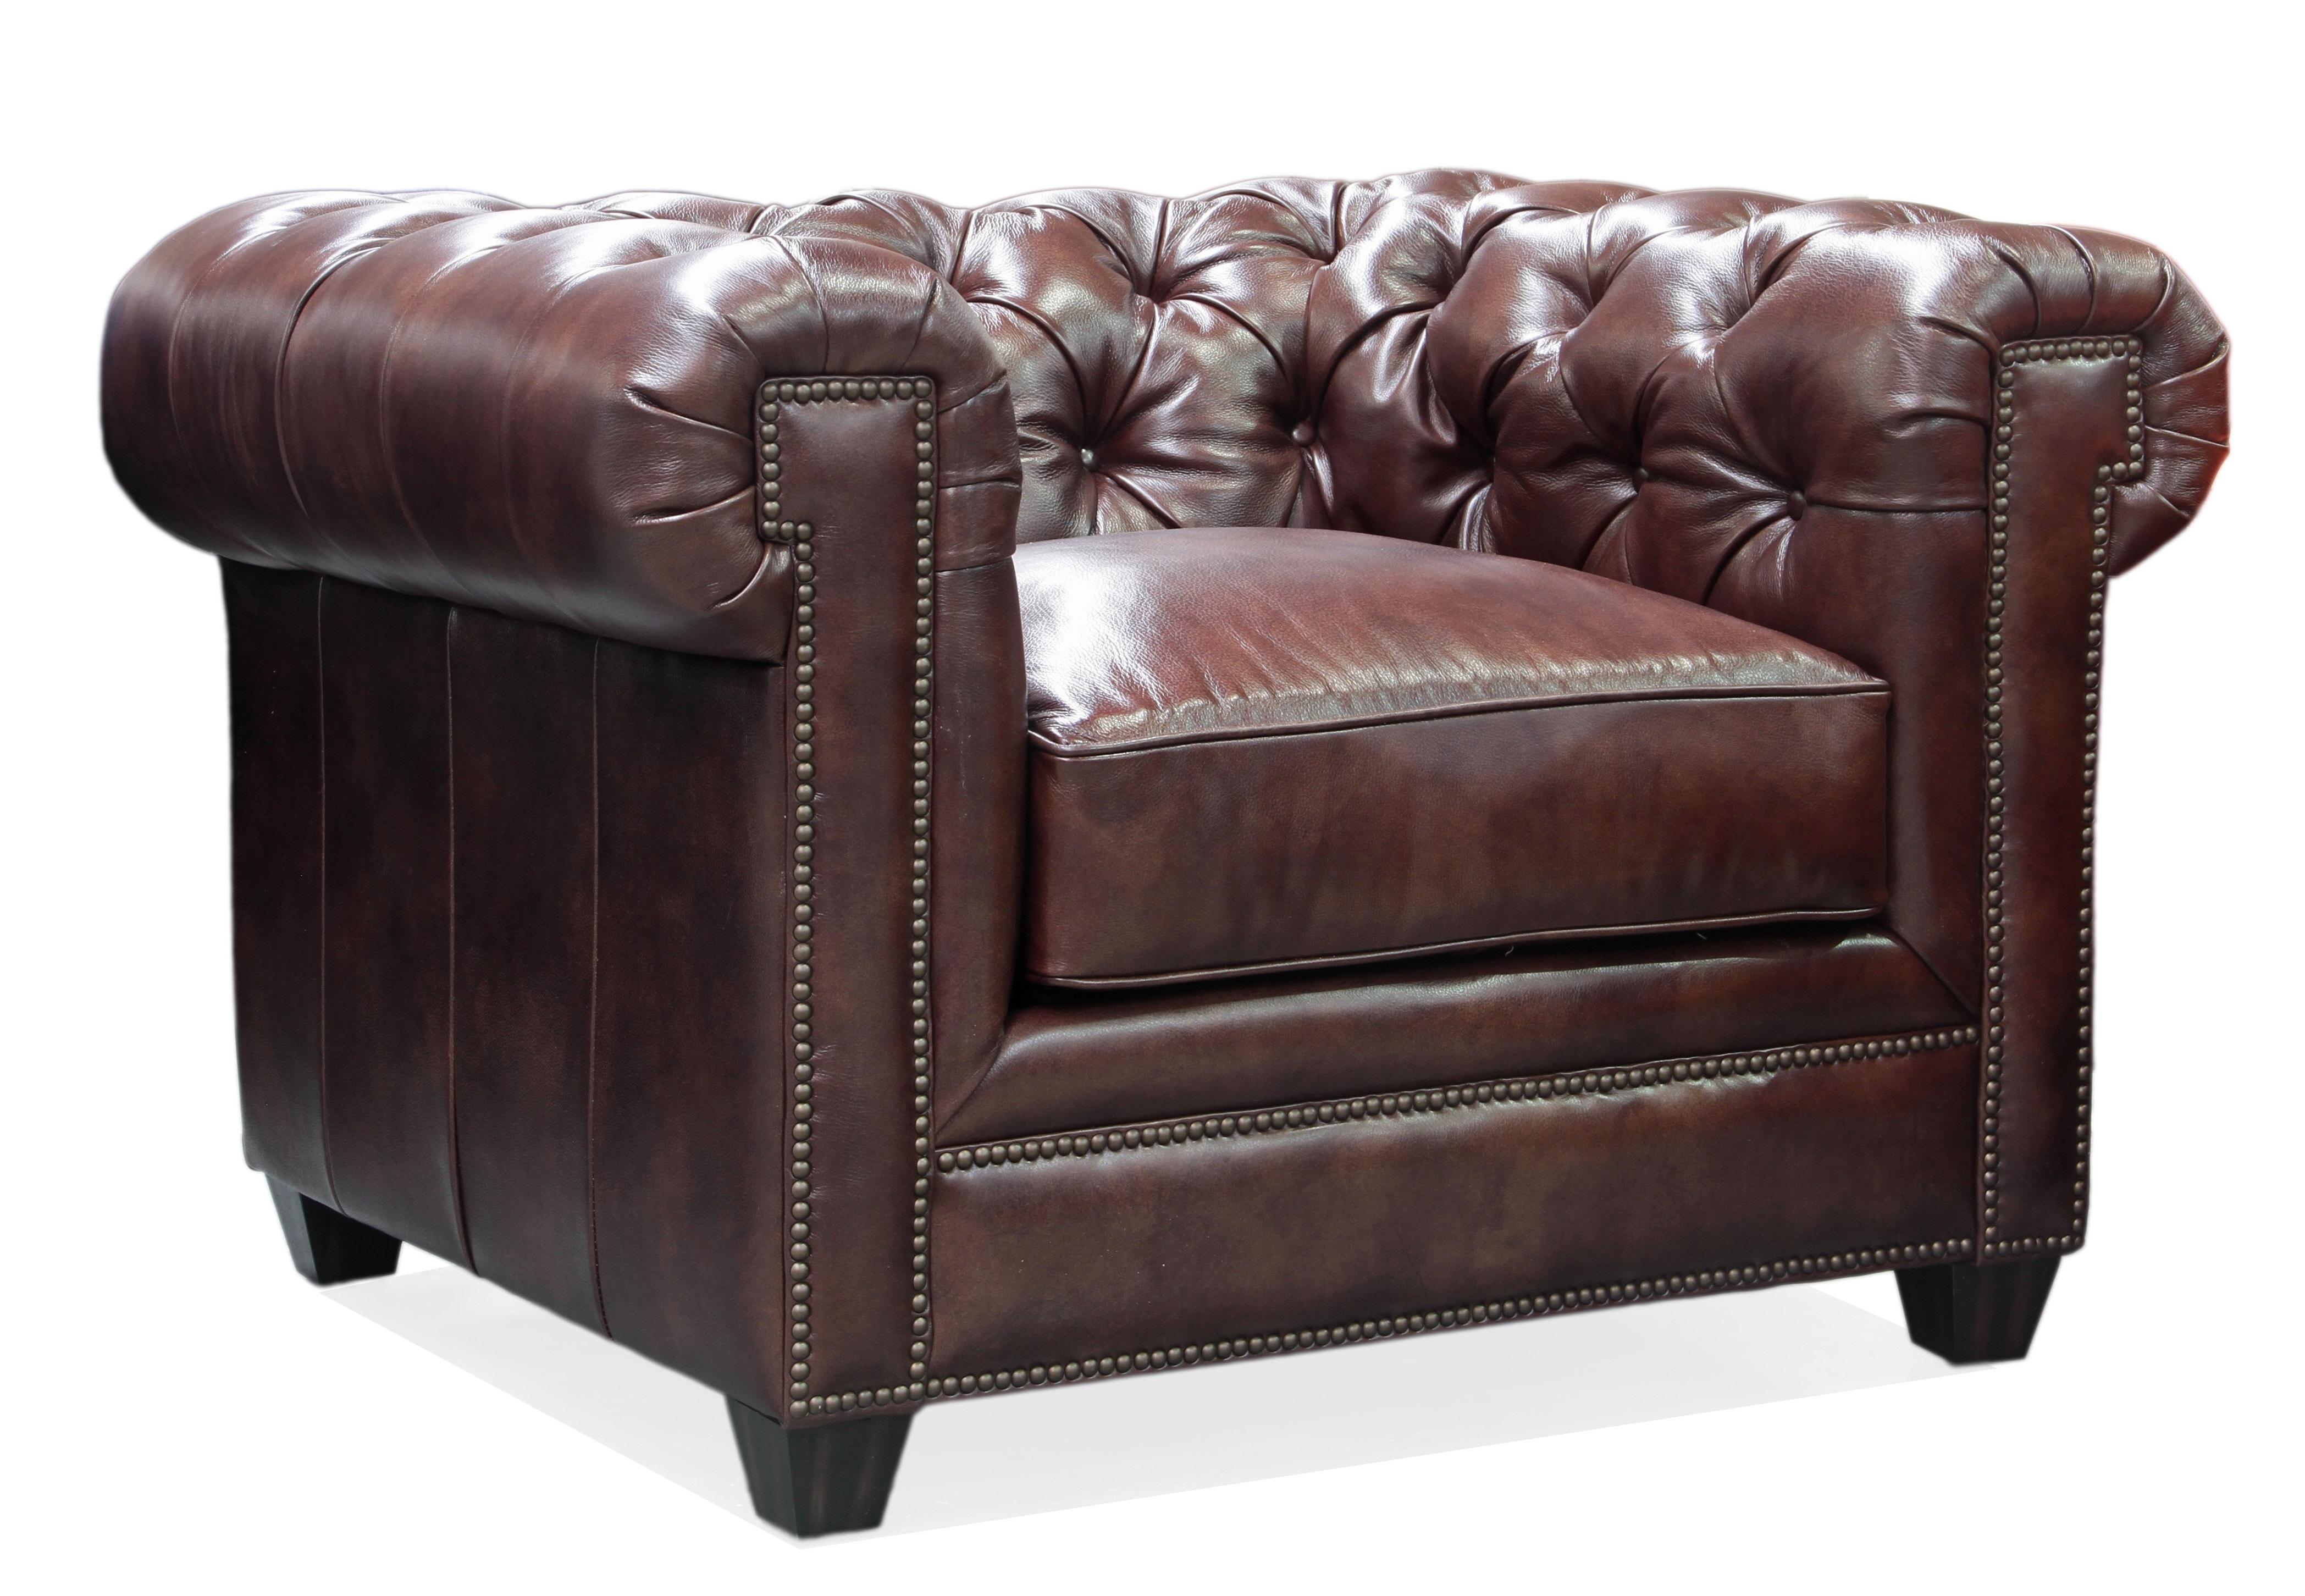 tufted leather sofa edmonton maroon coloured sofas hudson living room kingston chair 100 419400